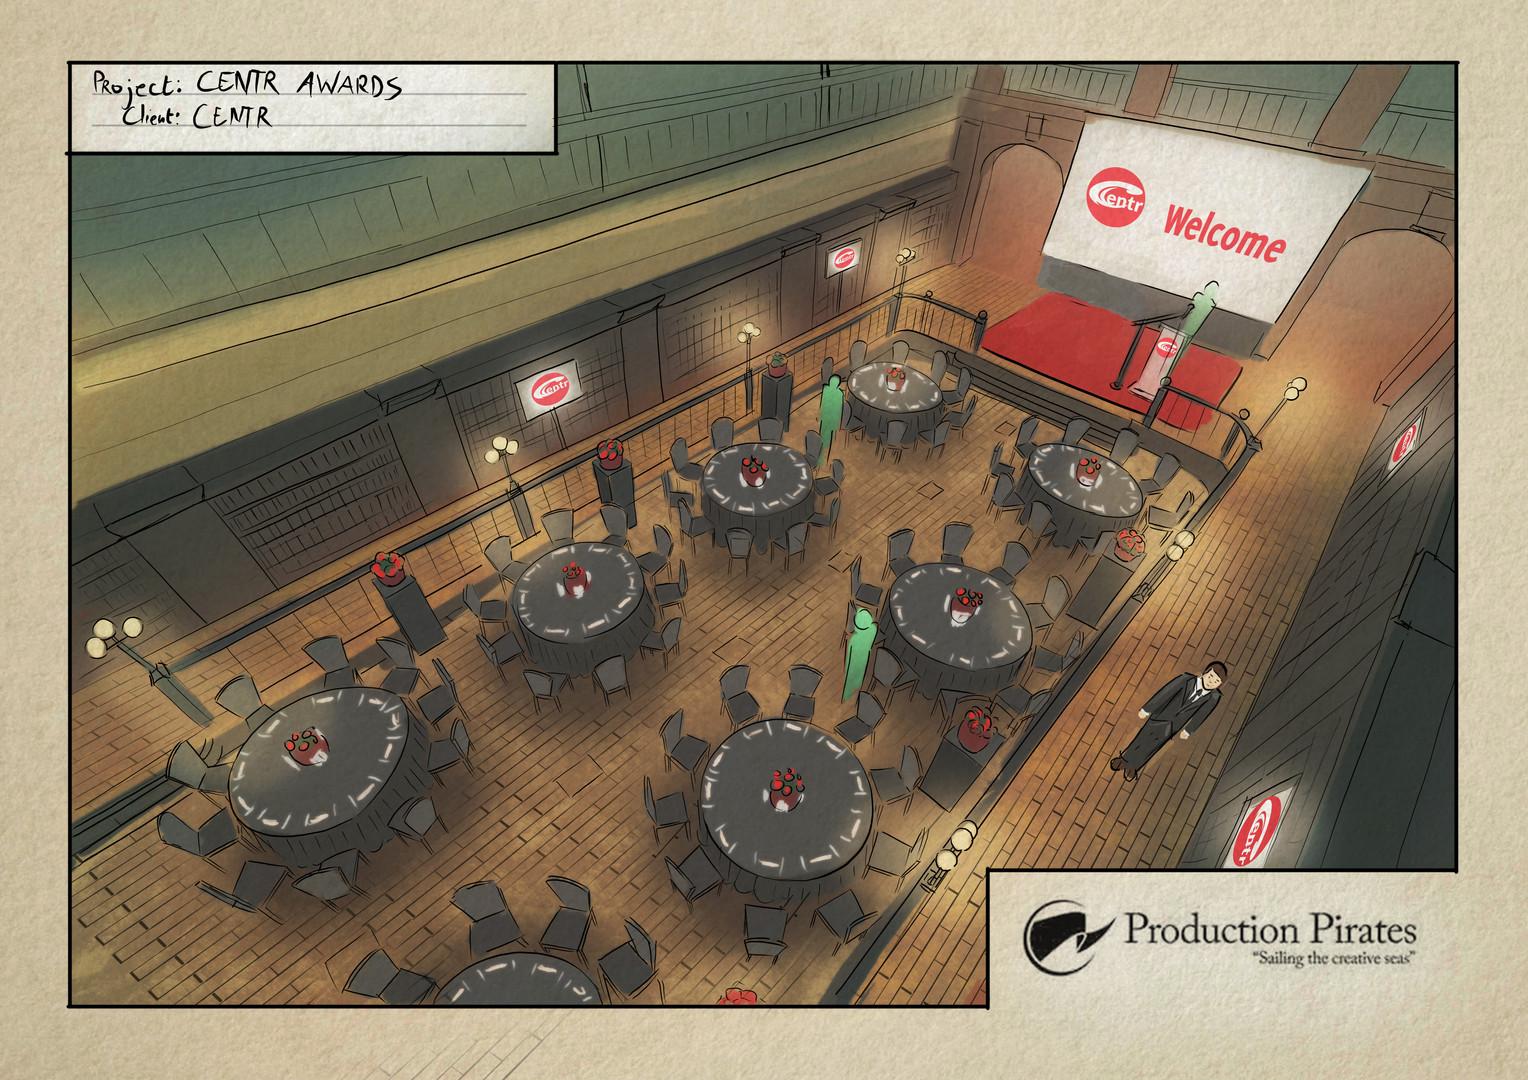 pp - centr awards centr concept.jpg